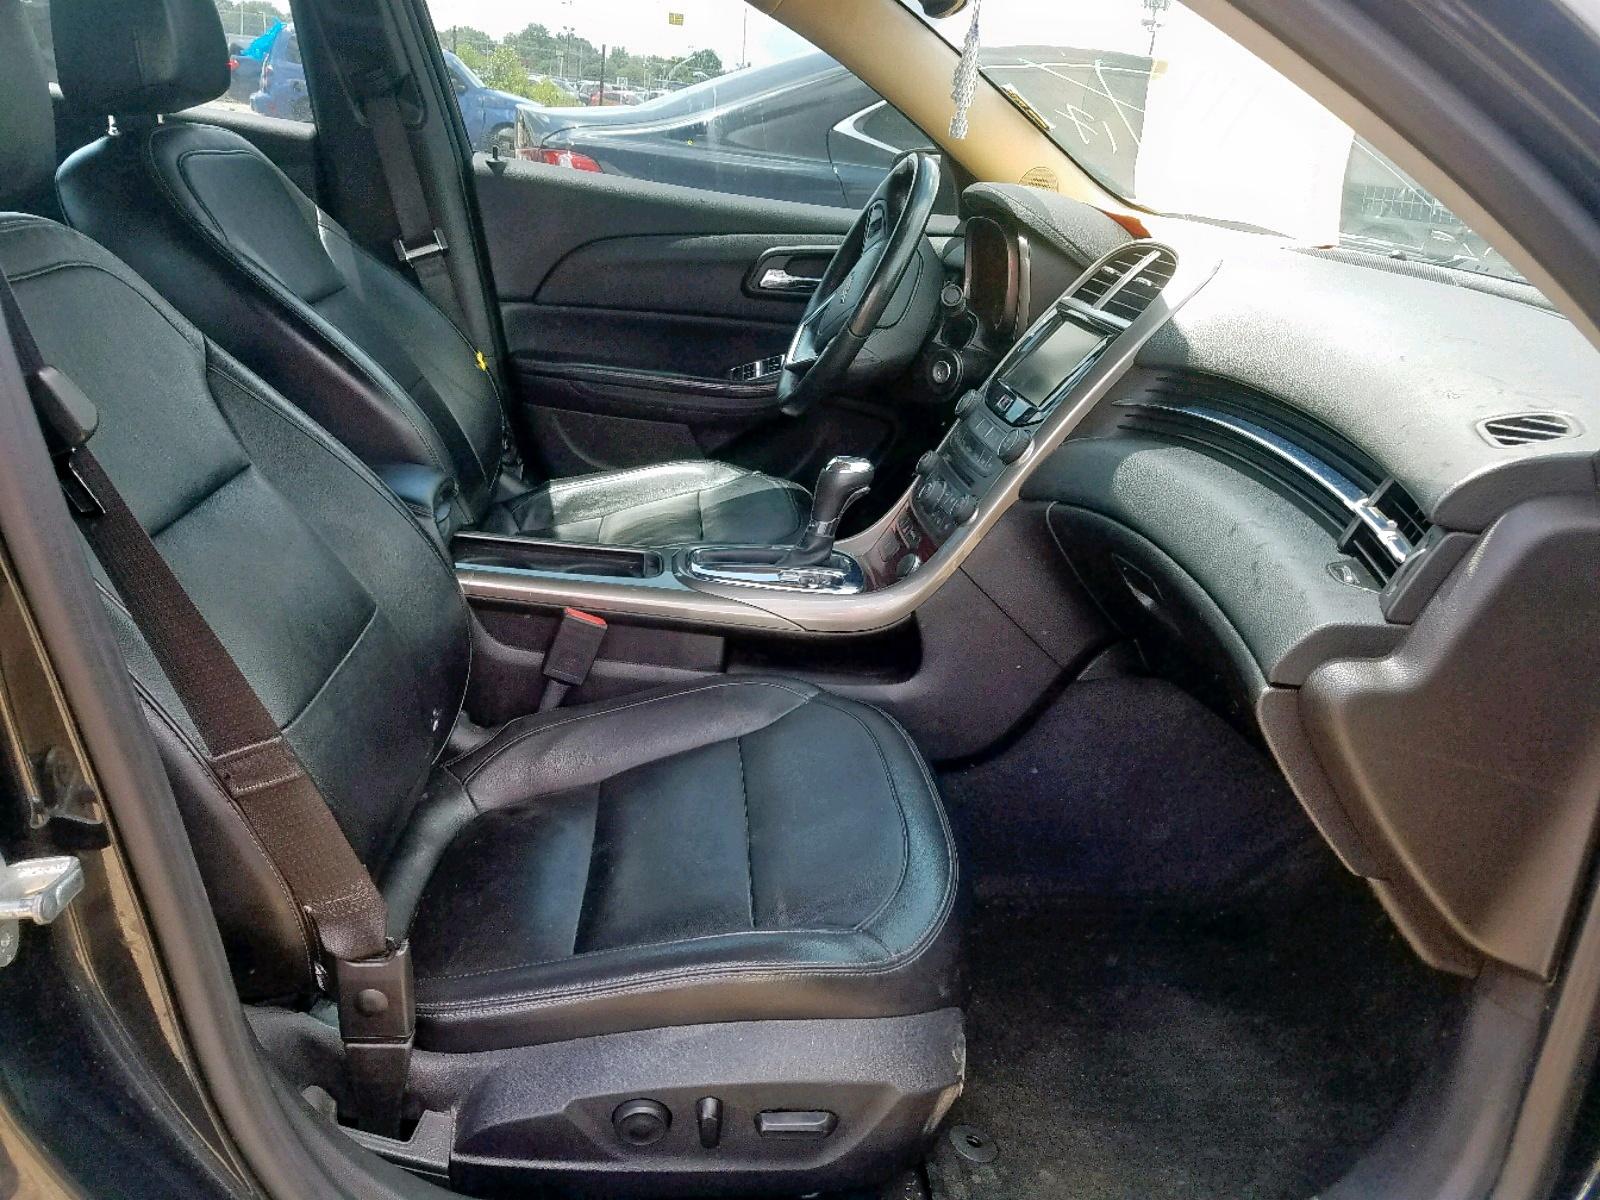 2013 Chevrolet Malibu Ltz 2.5L close up View